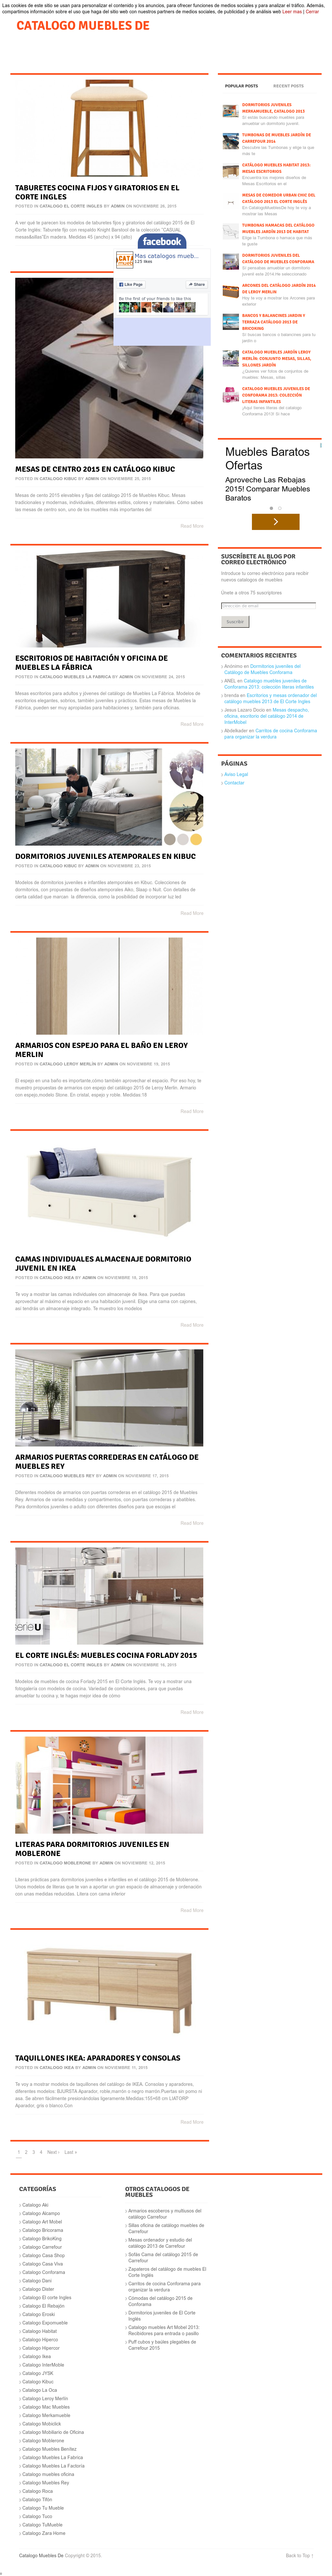 Mas Catalogos Muebles Competitors, Revenue and Employees ...